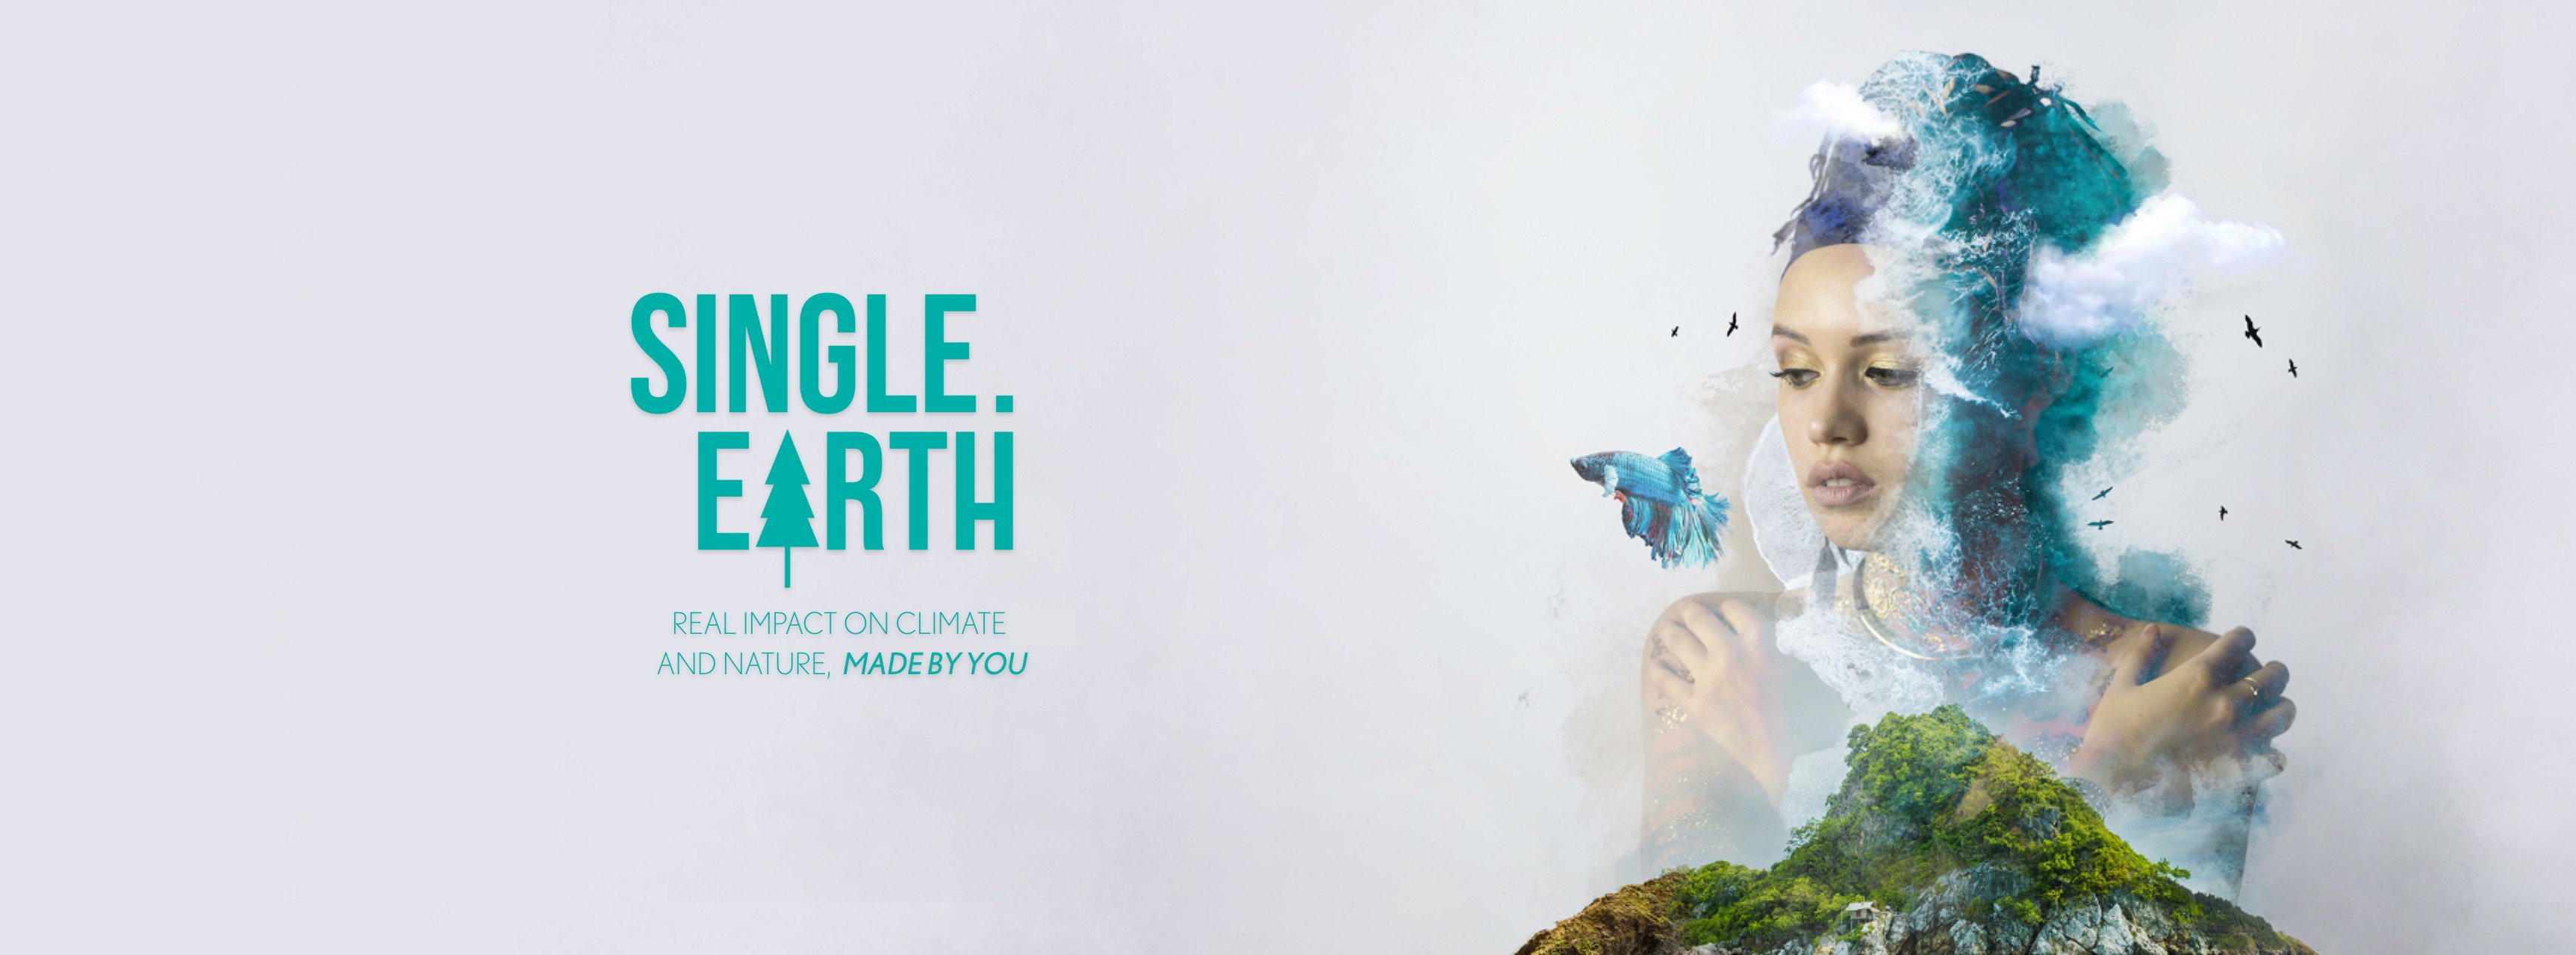 Single Earth Impact on Climate